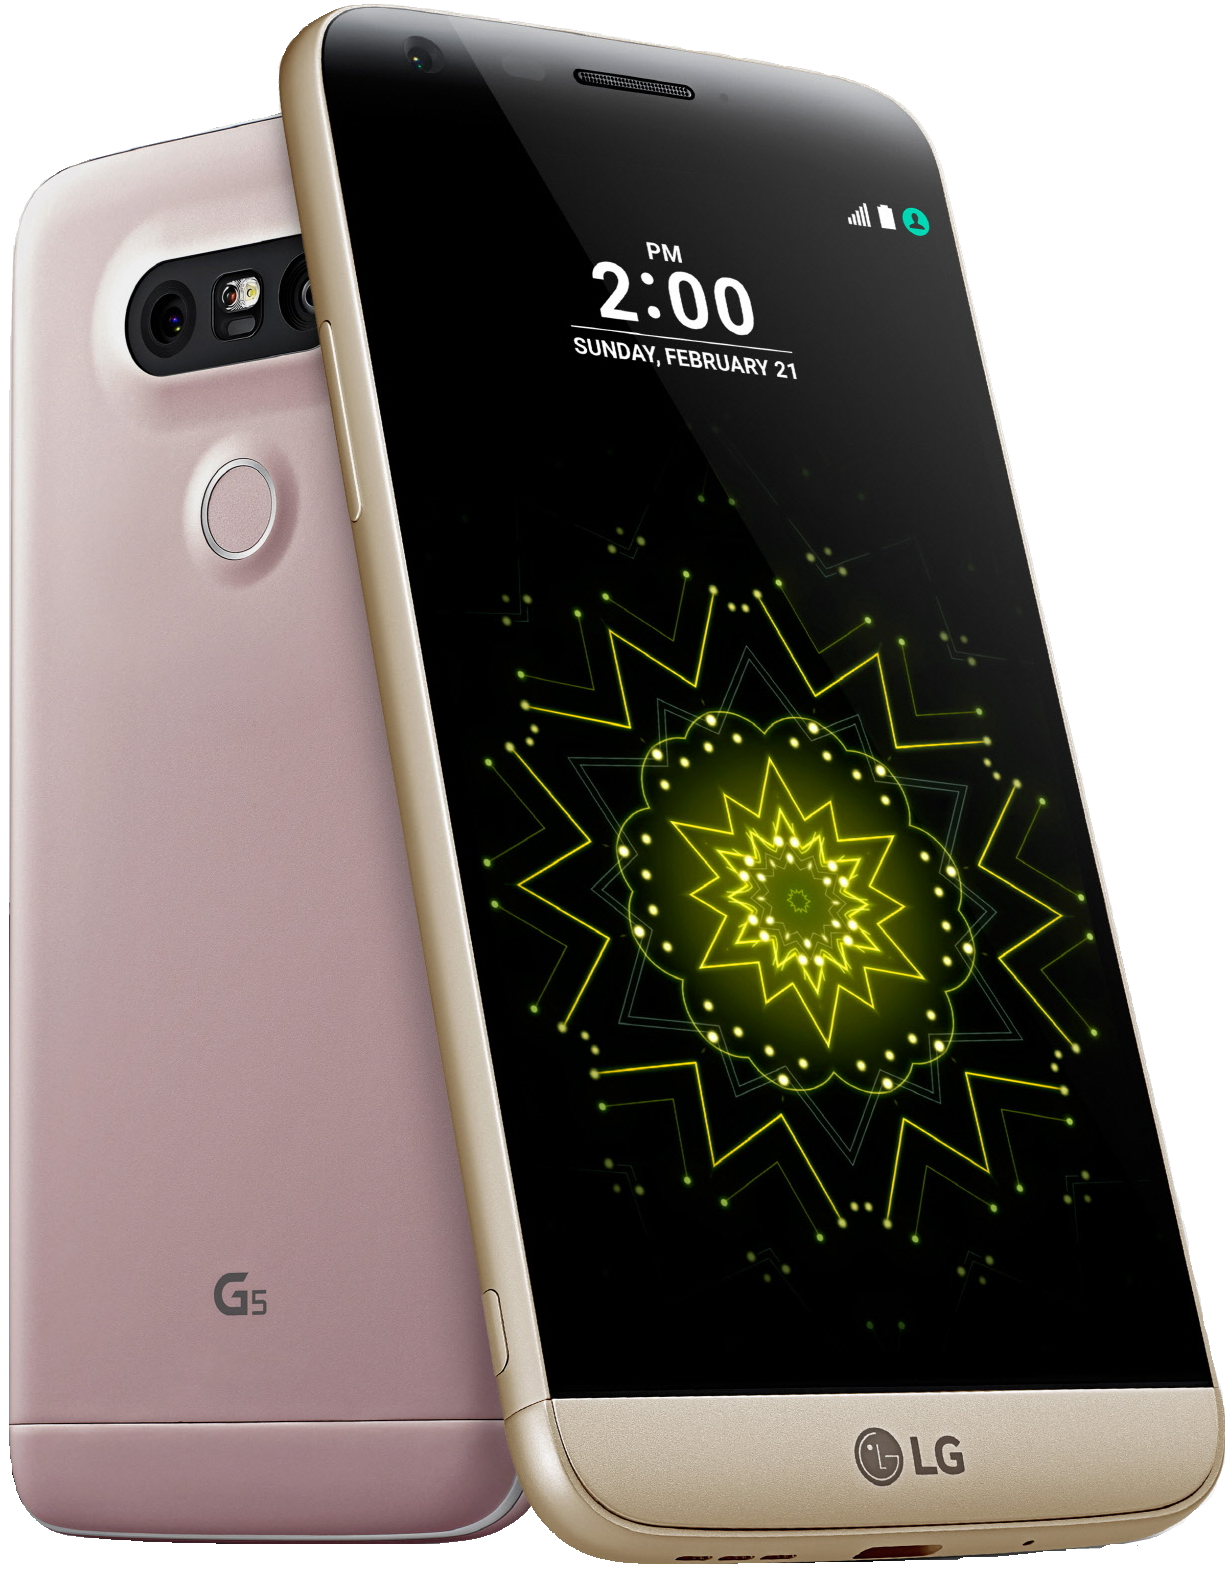 LG G5 (US Unlocked) (rs988)